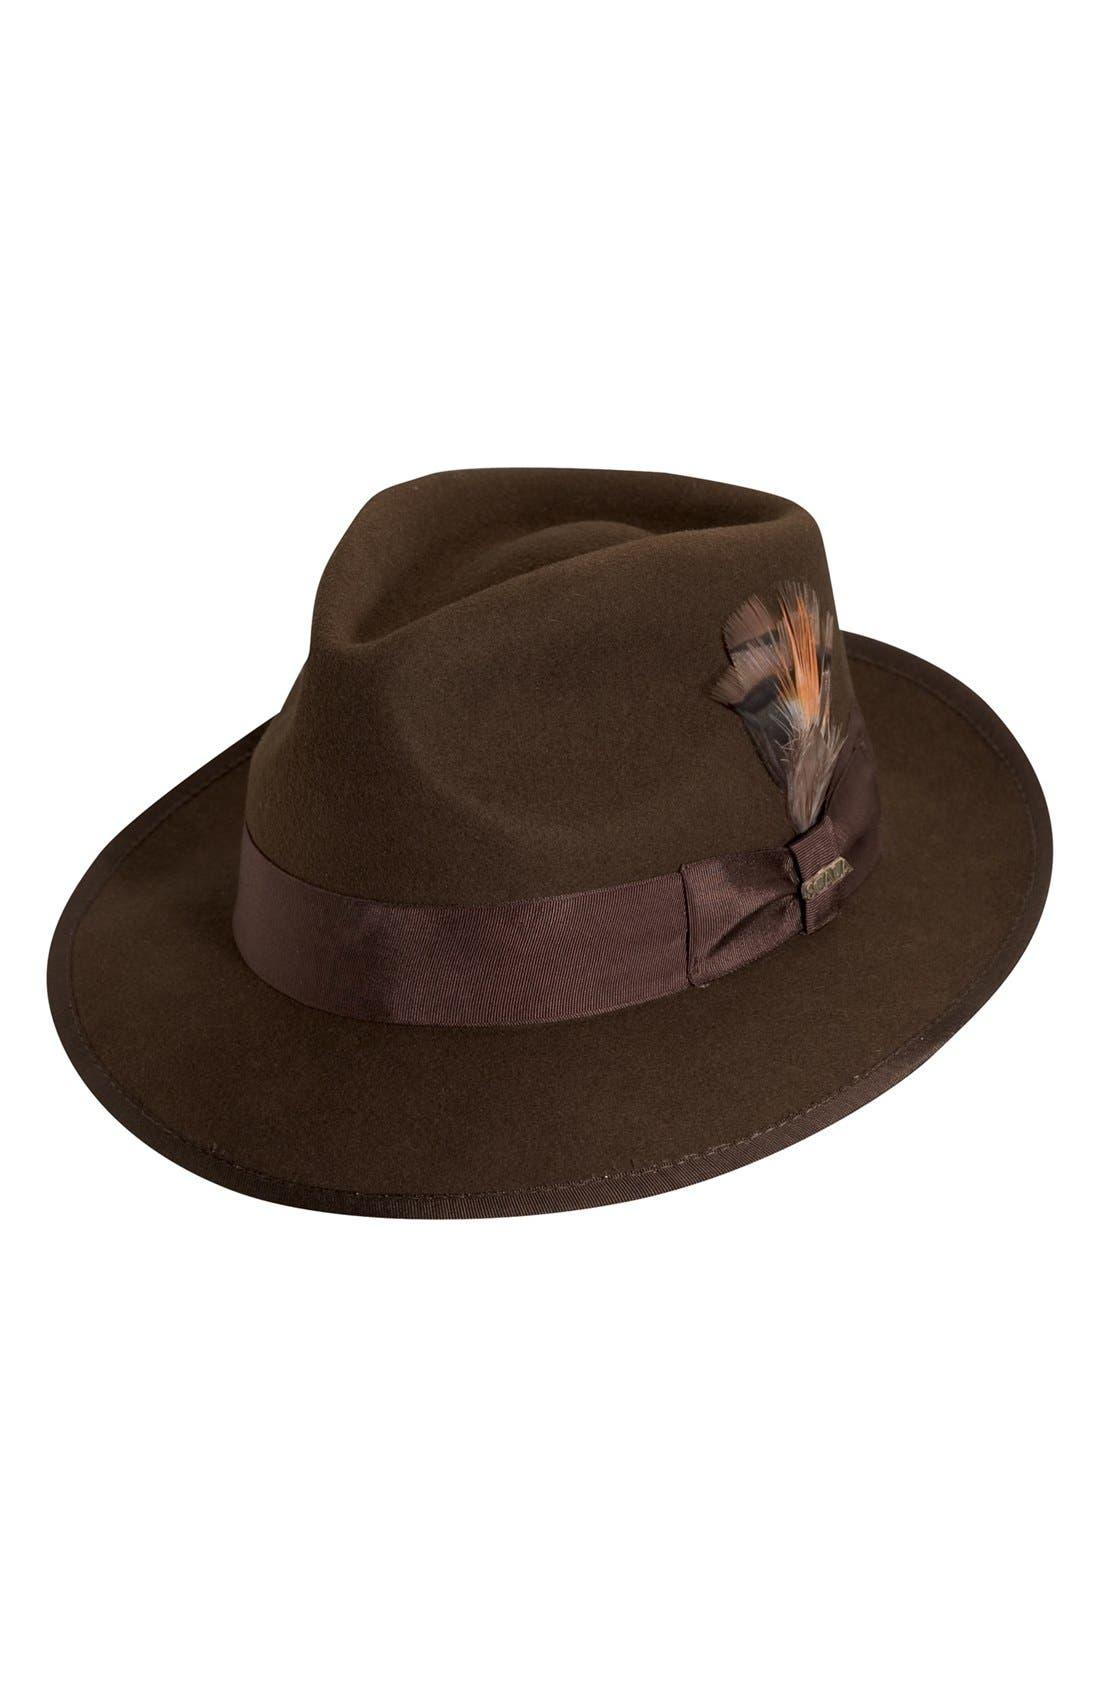 Main Image - Scala 'Classico' Wool Felt Snap Brim Hat